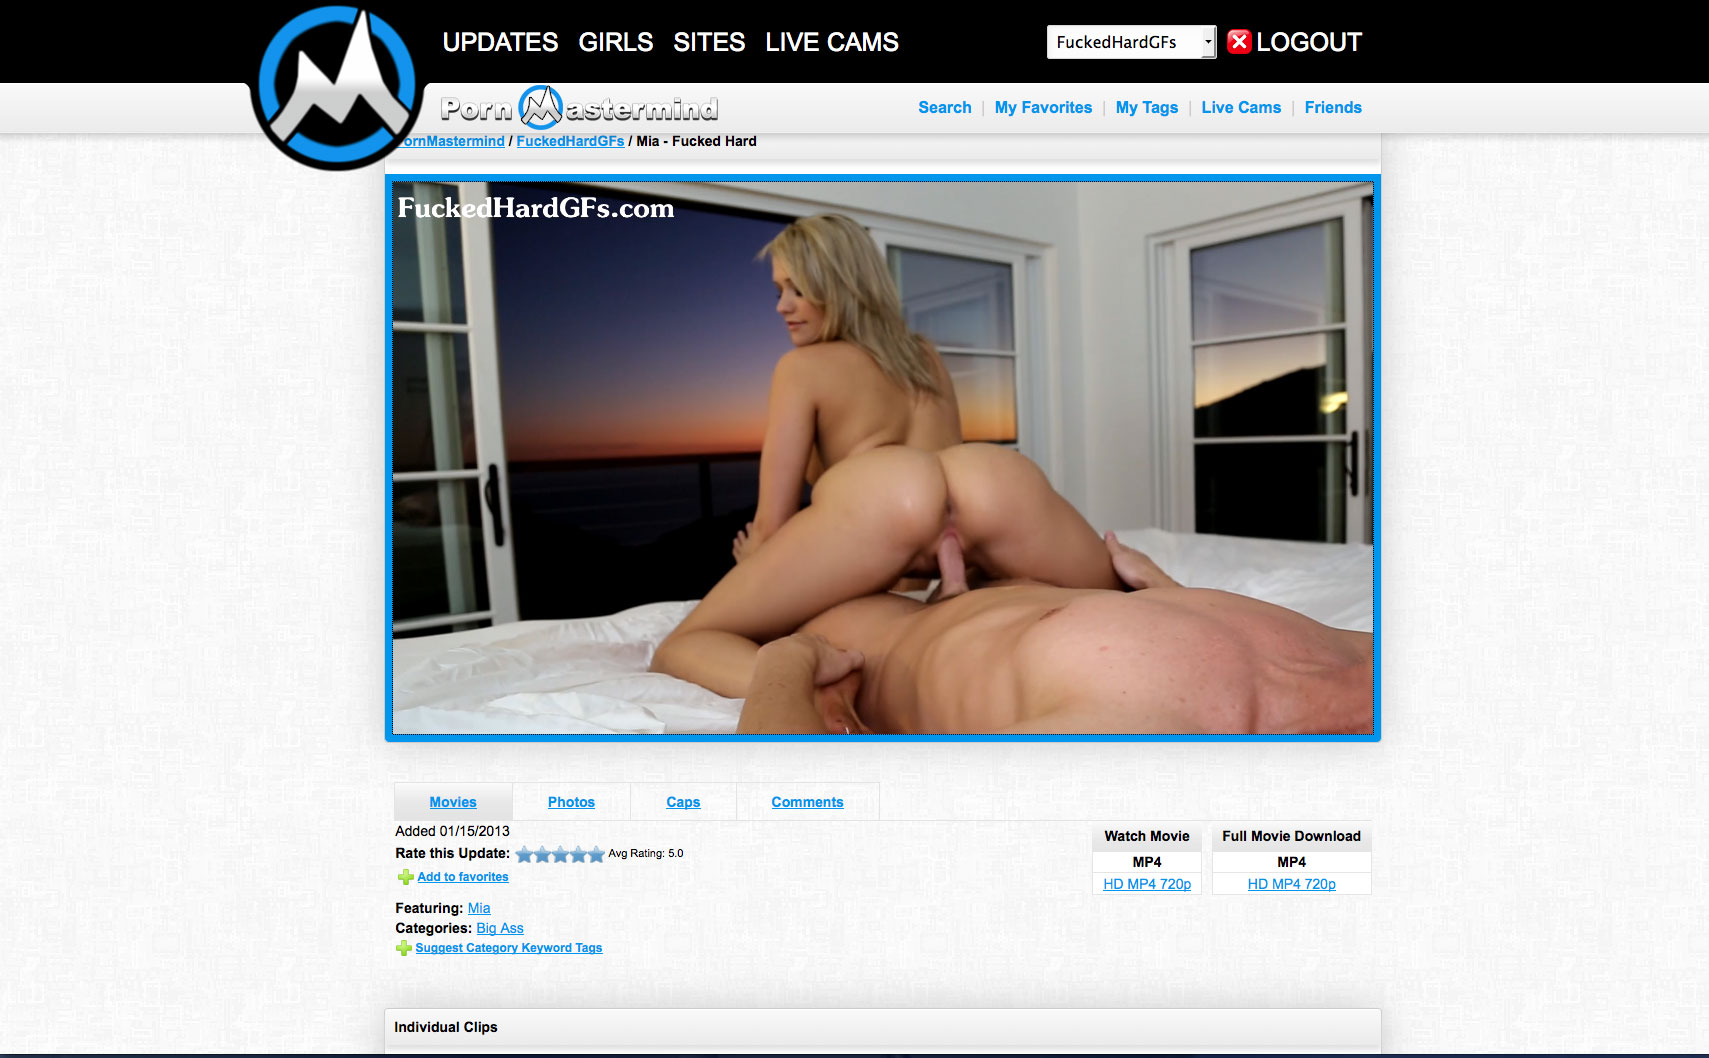 720P Odd Porn all hd review - porn mastermind